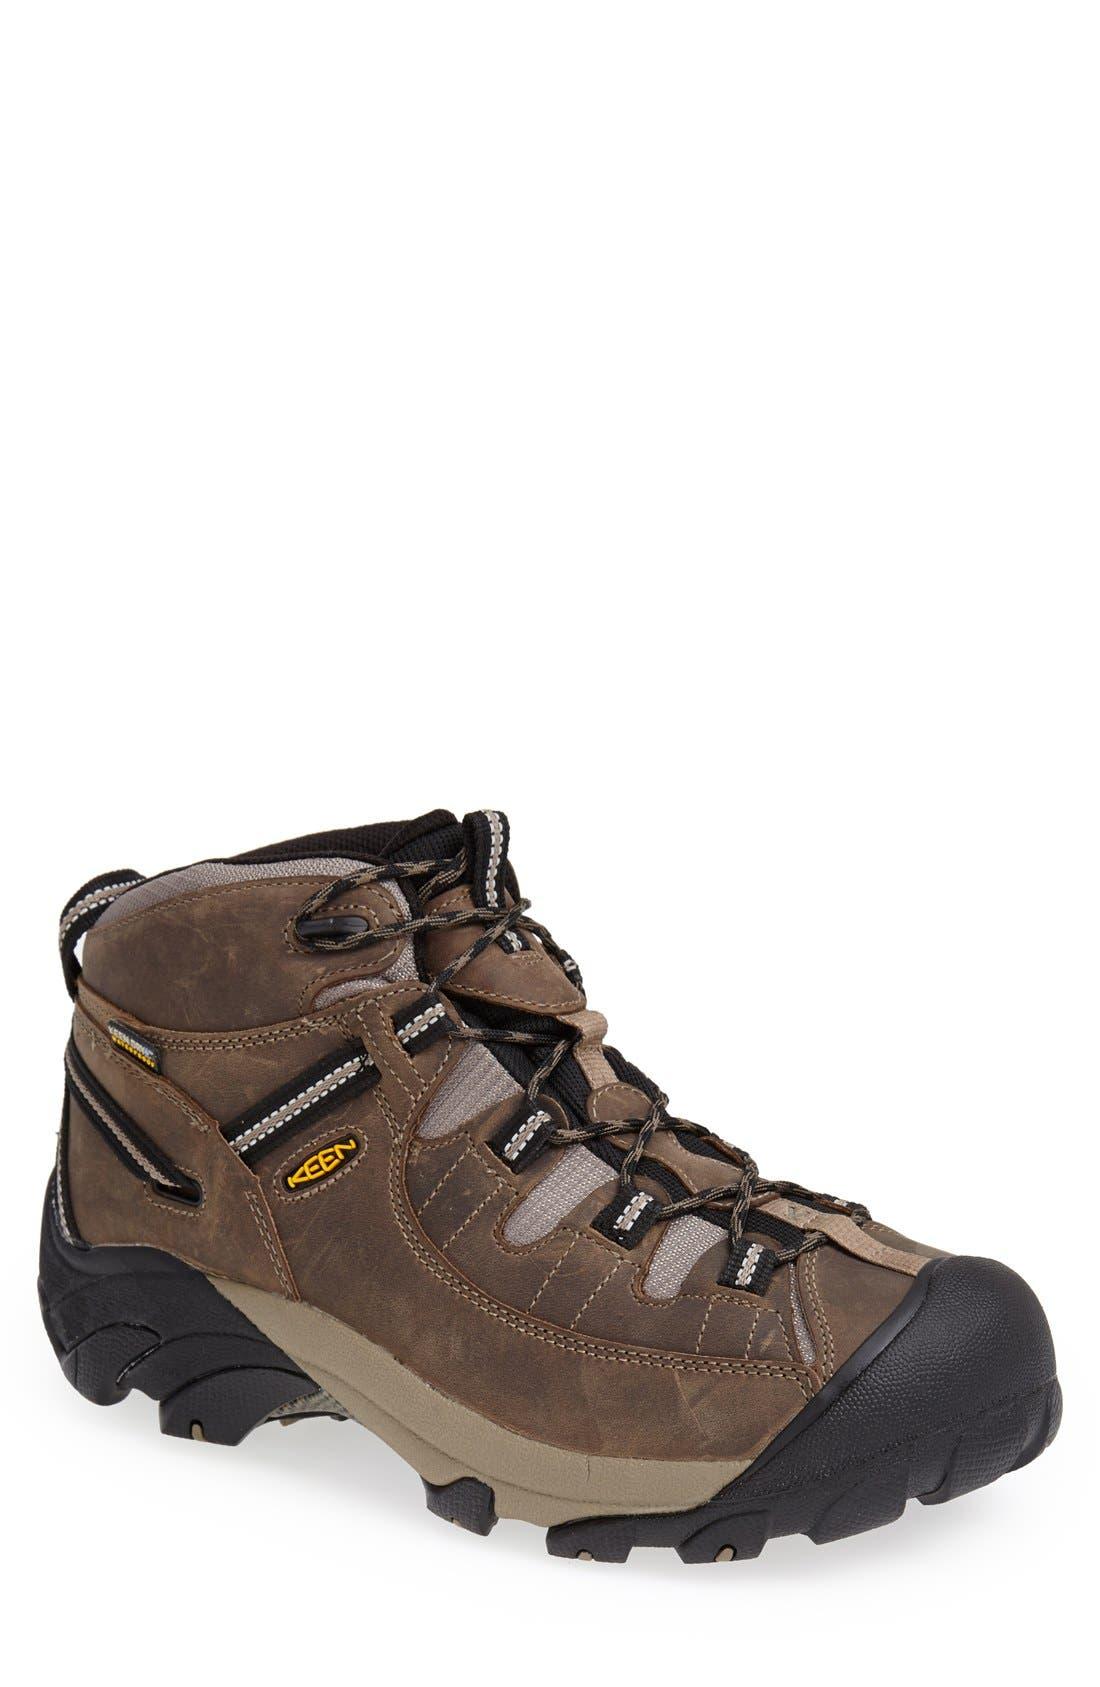 Main Image - Keen 'Targhee II Mid' Hiking Boot (Men)